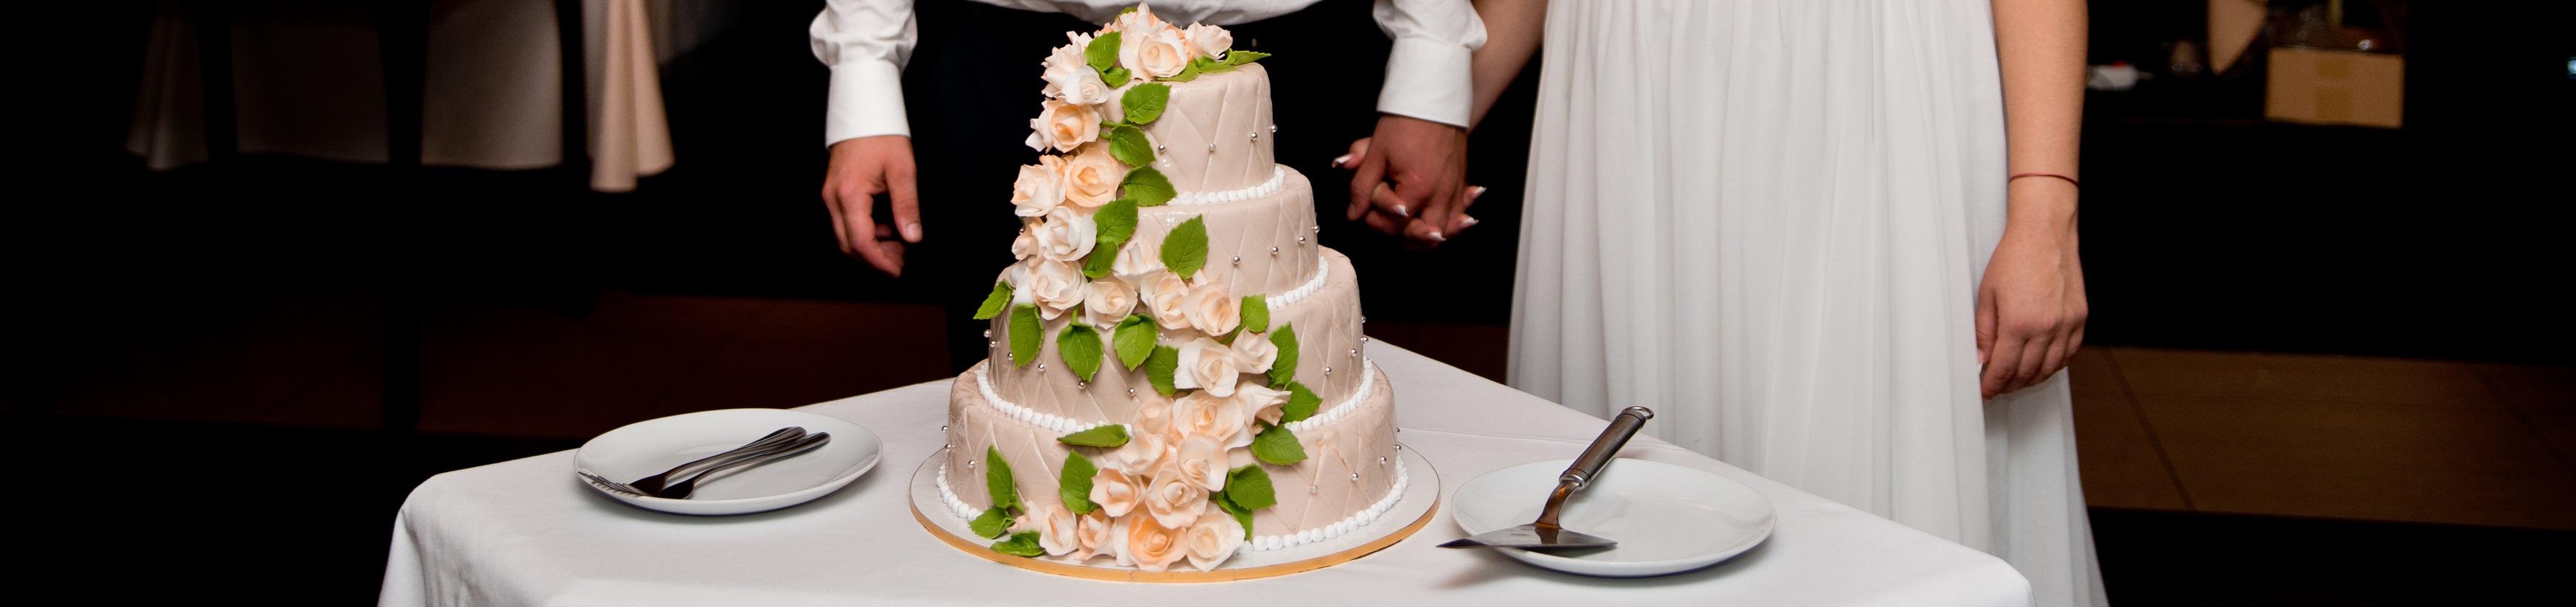 Hochzeit Catering Hannover